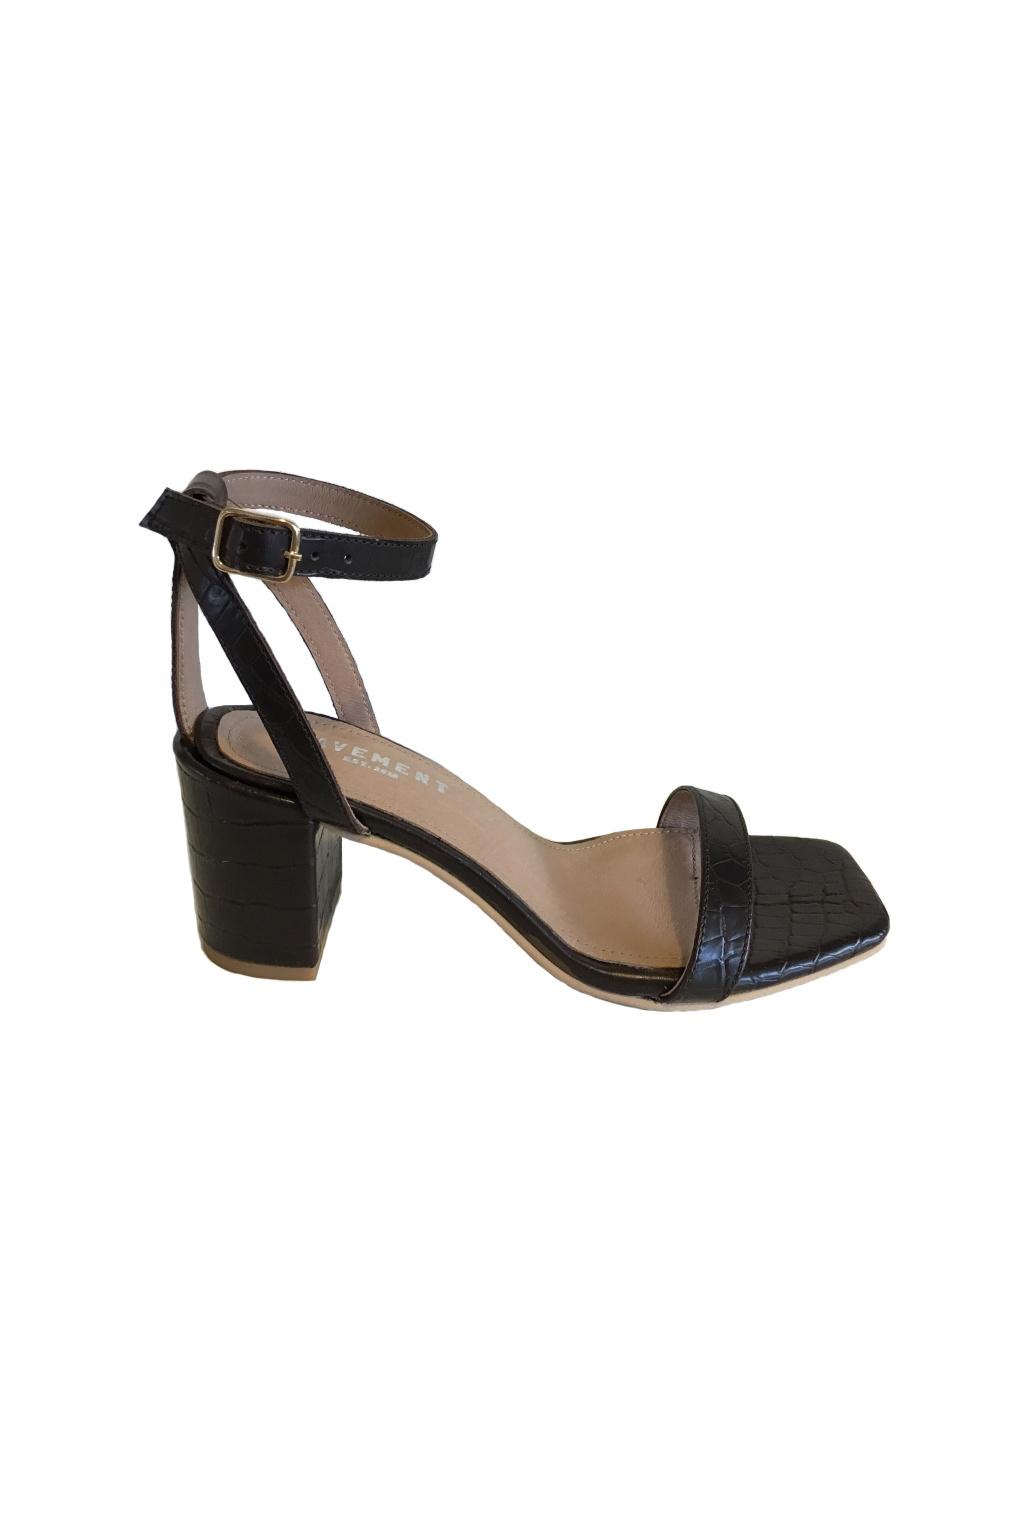 Else Sandaal - Zwart Croco-1